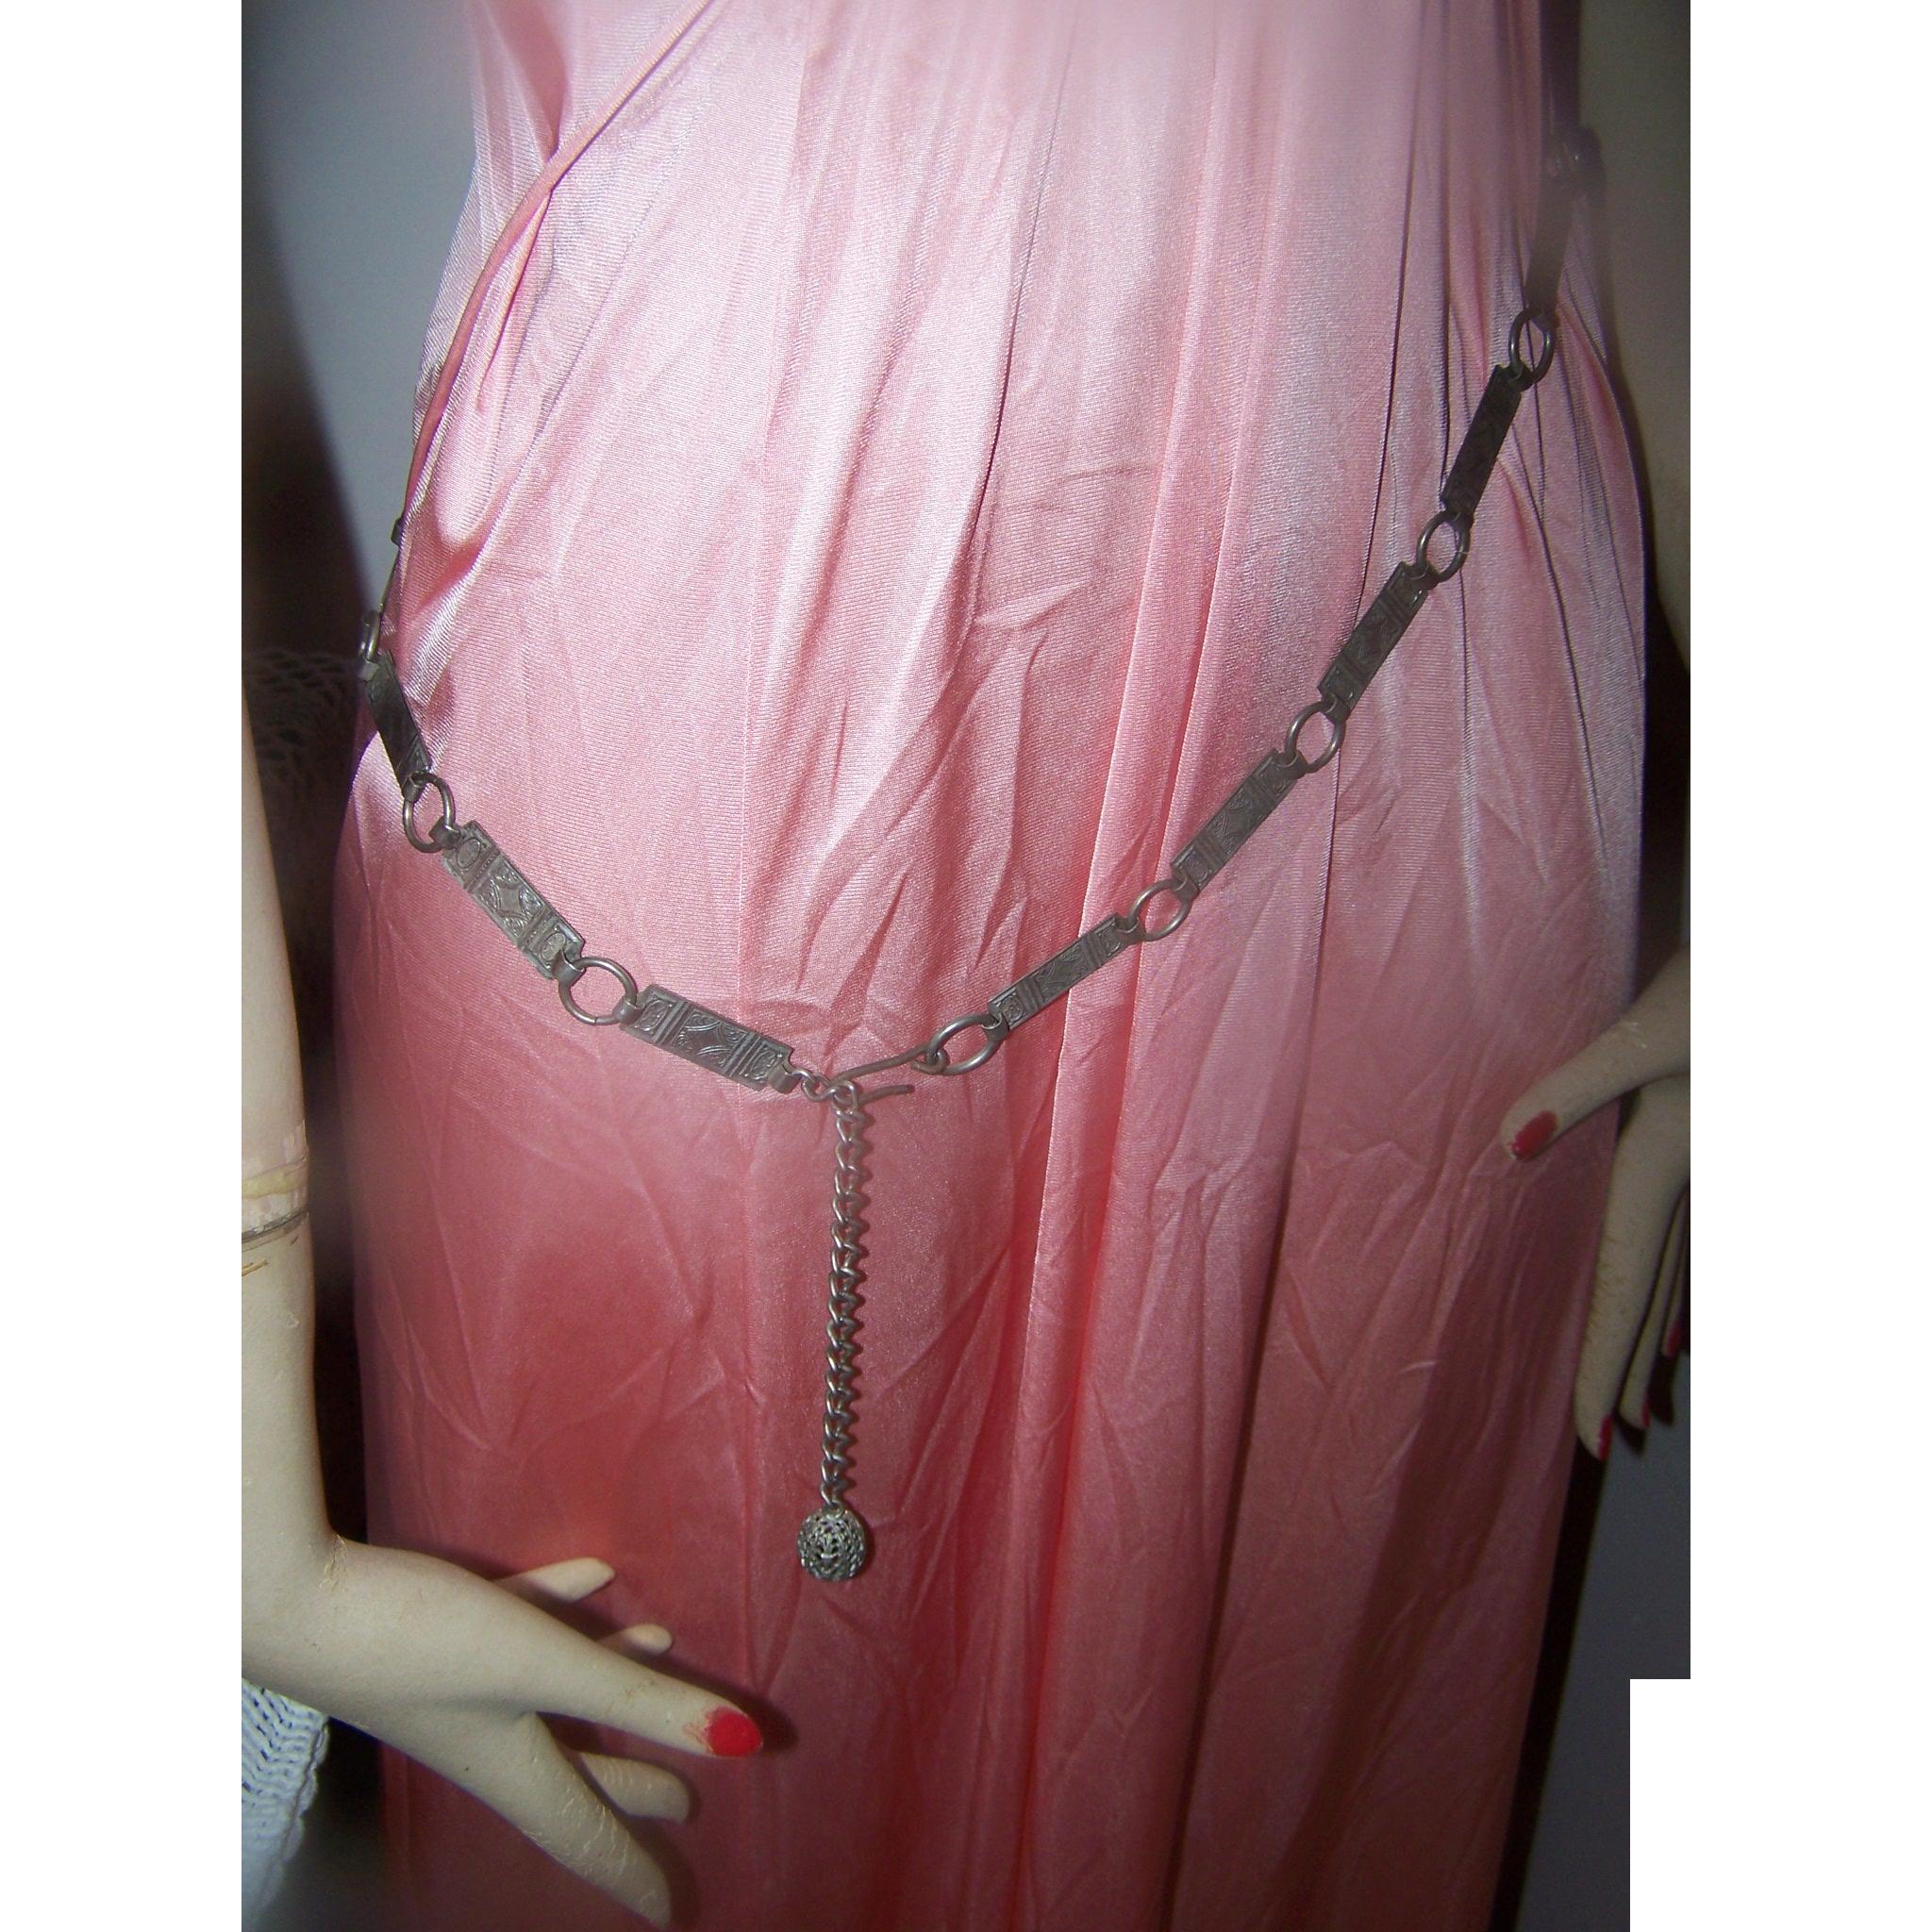 Ornate Decorative Engraved Machine Style  Link Style Flapper Girl Era Metal Ladies Fashion Belt with Filigree Ball Dangle